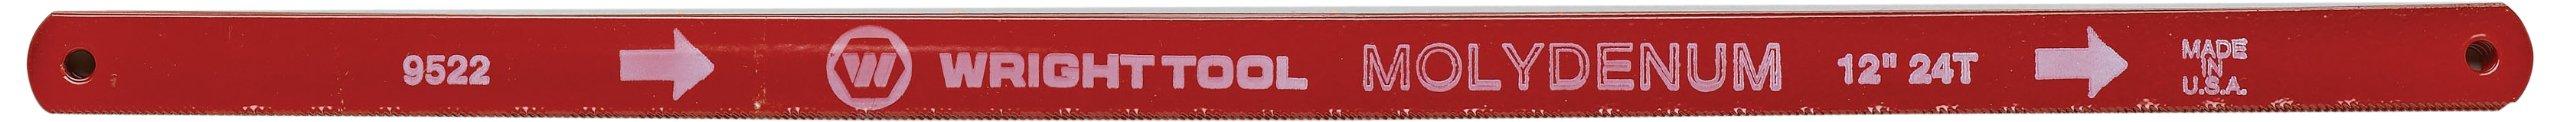 Wright Tool 9522 20/24T 12-Inch Bi-Metal Hacksaw Blade